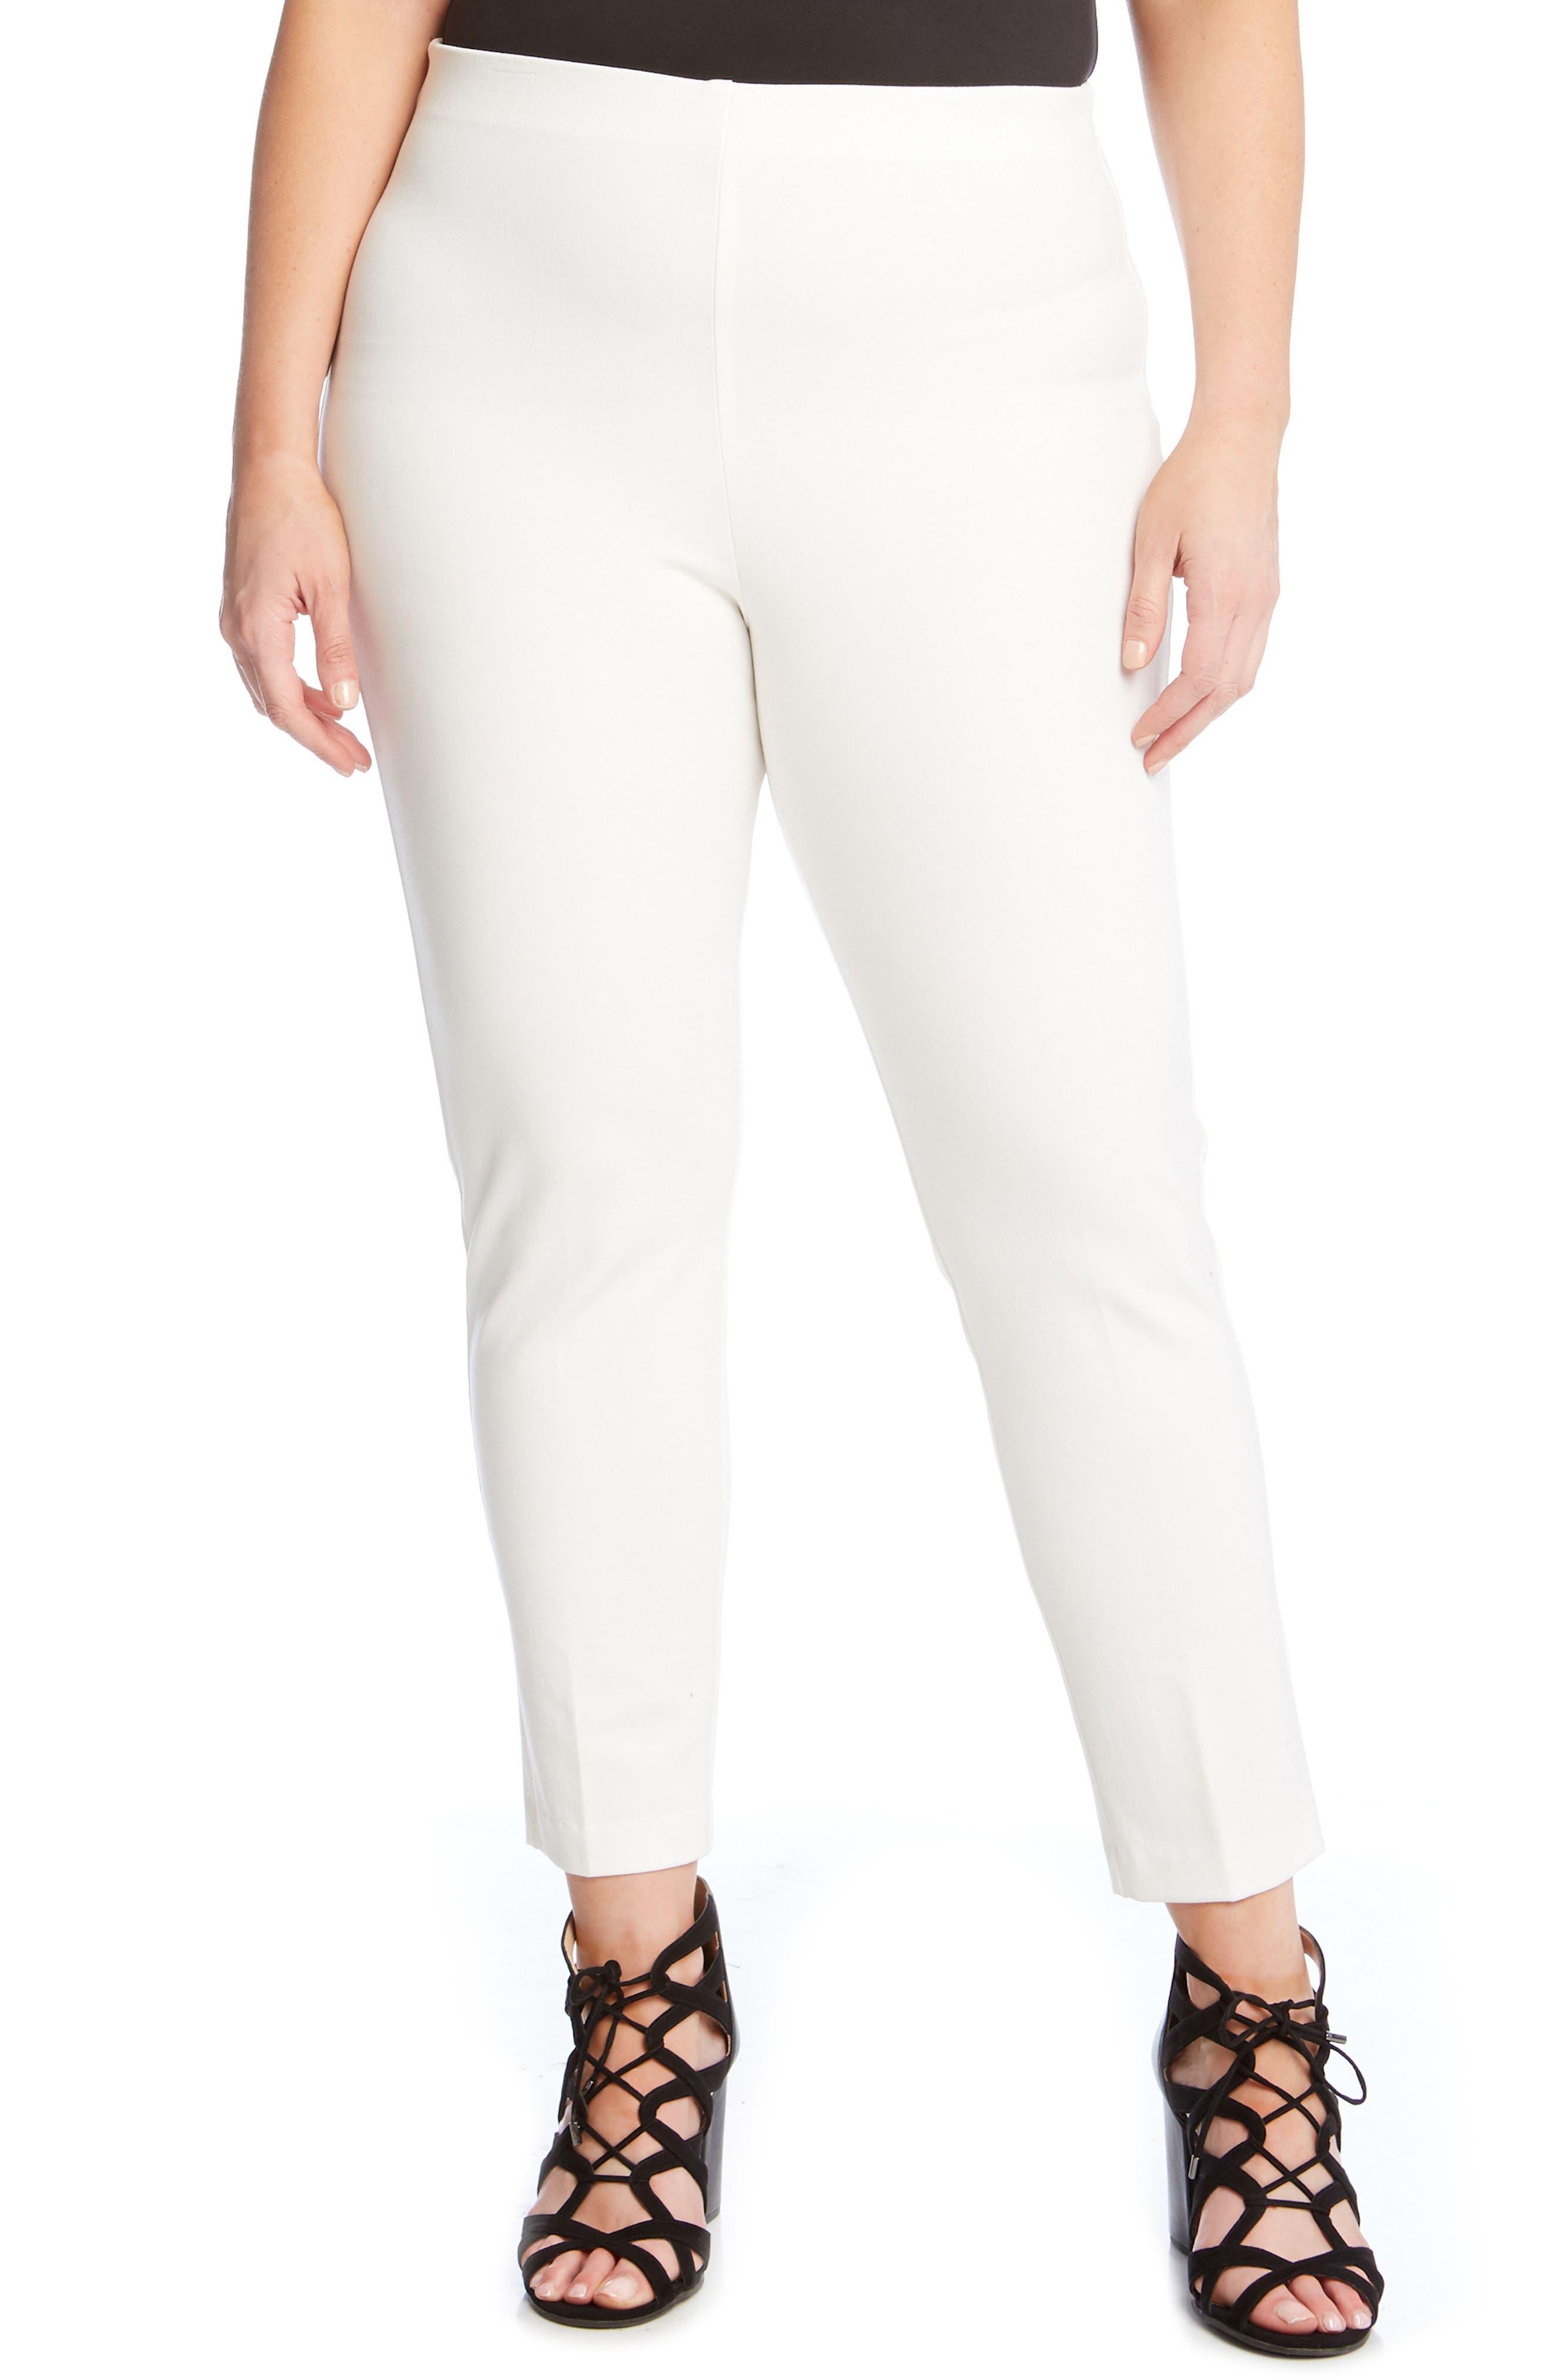 KAREN KANE, Piper Skinny Ankle Pants, Main thumbnail 1, color, OFF WHITE